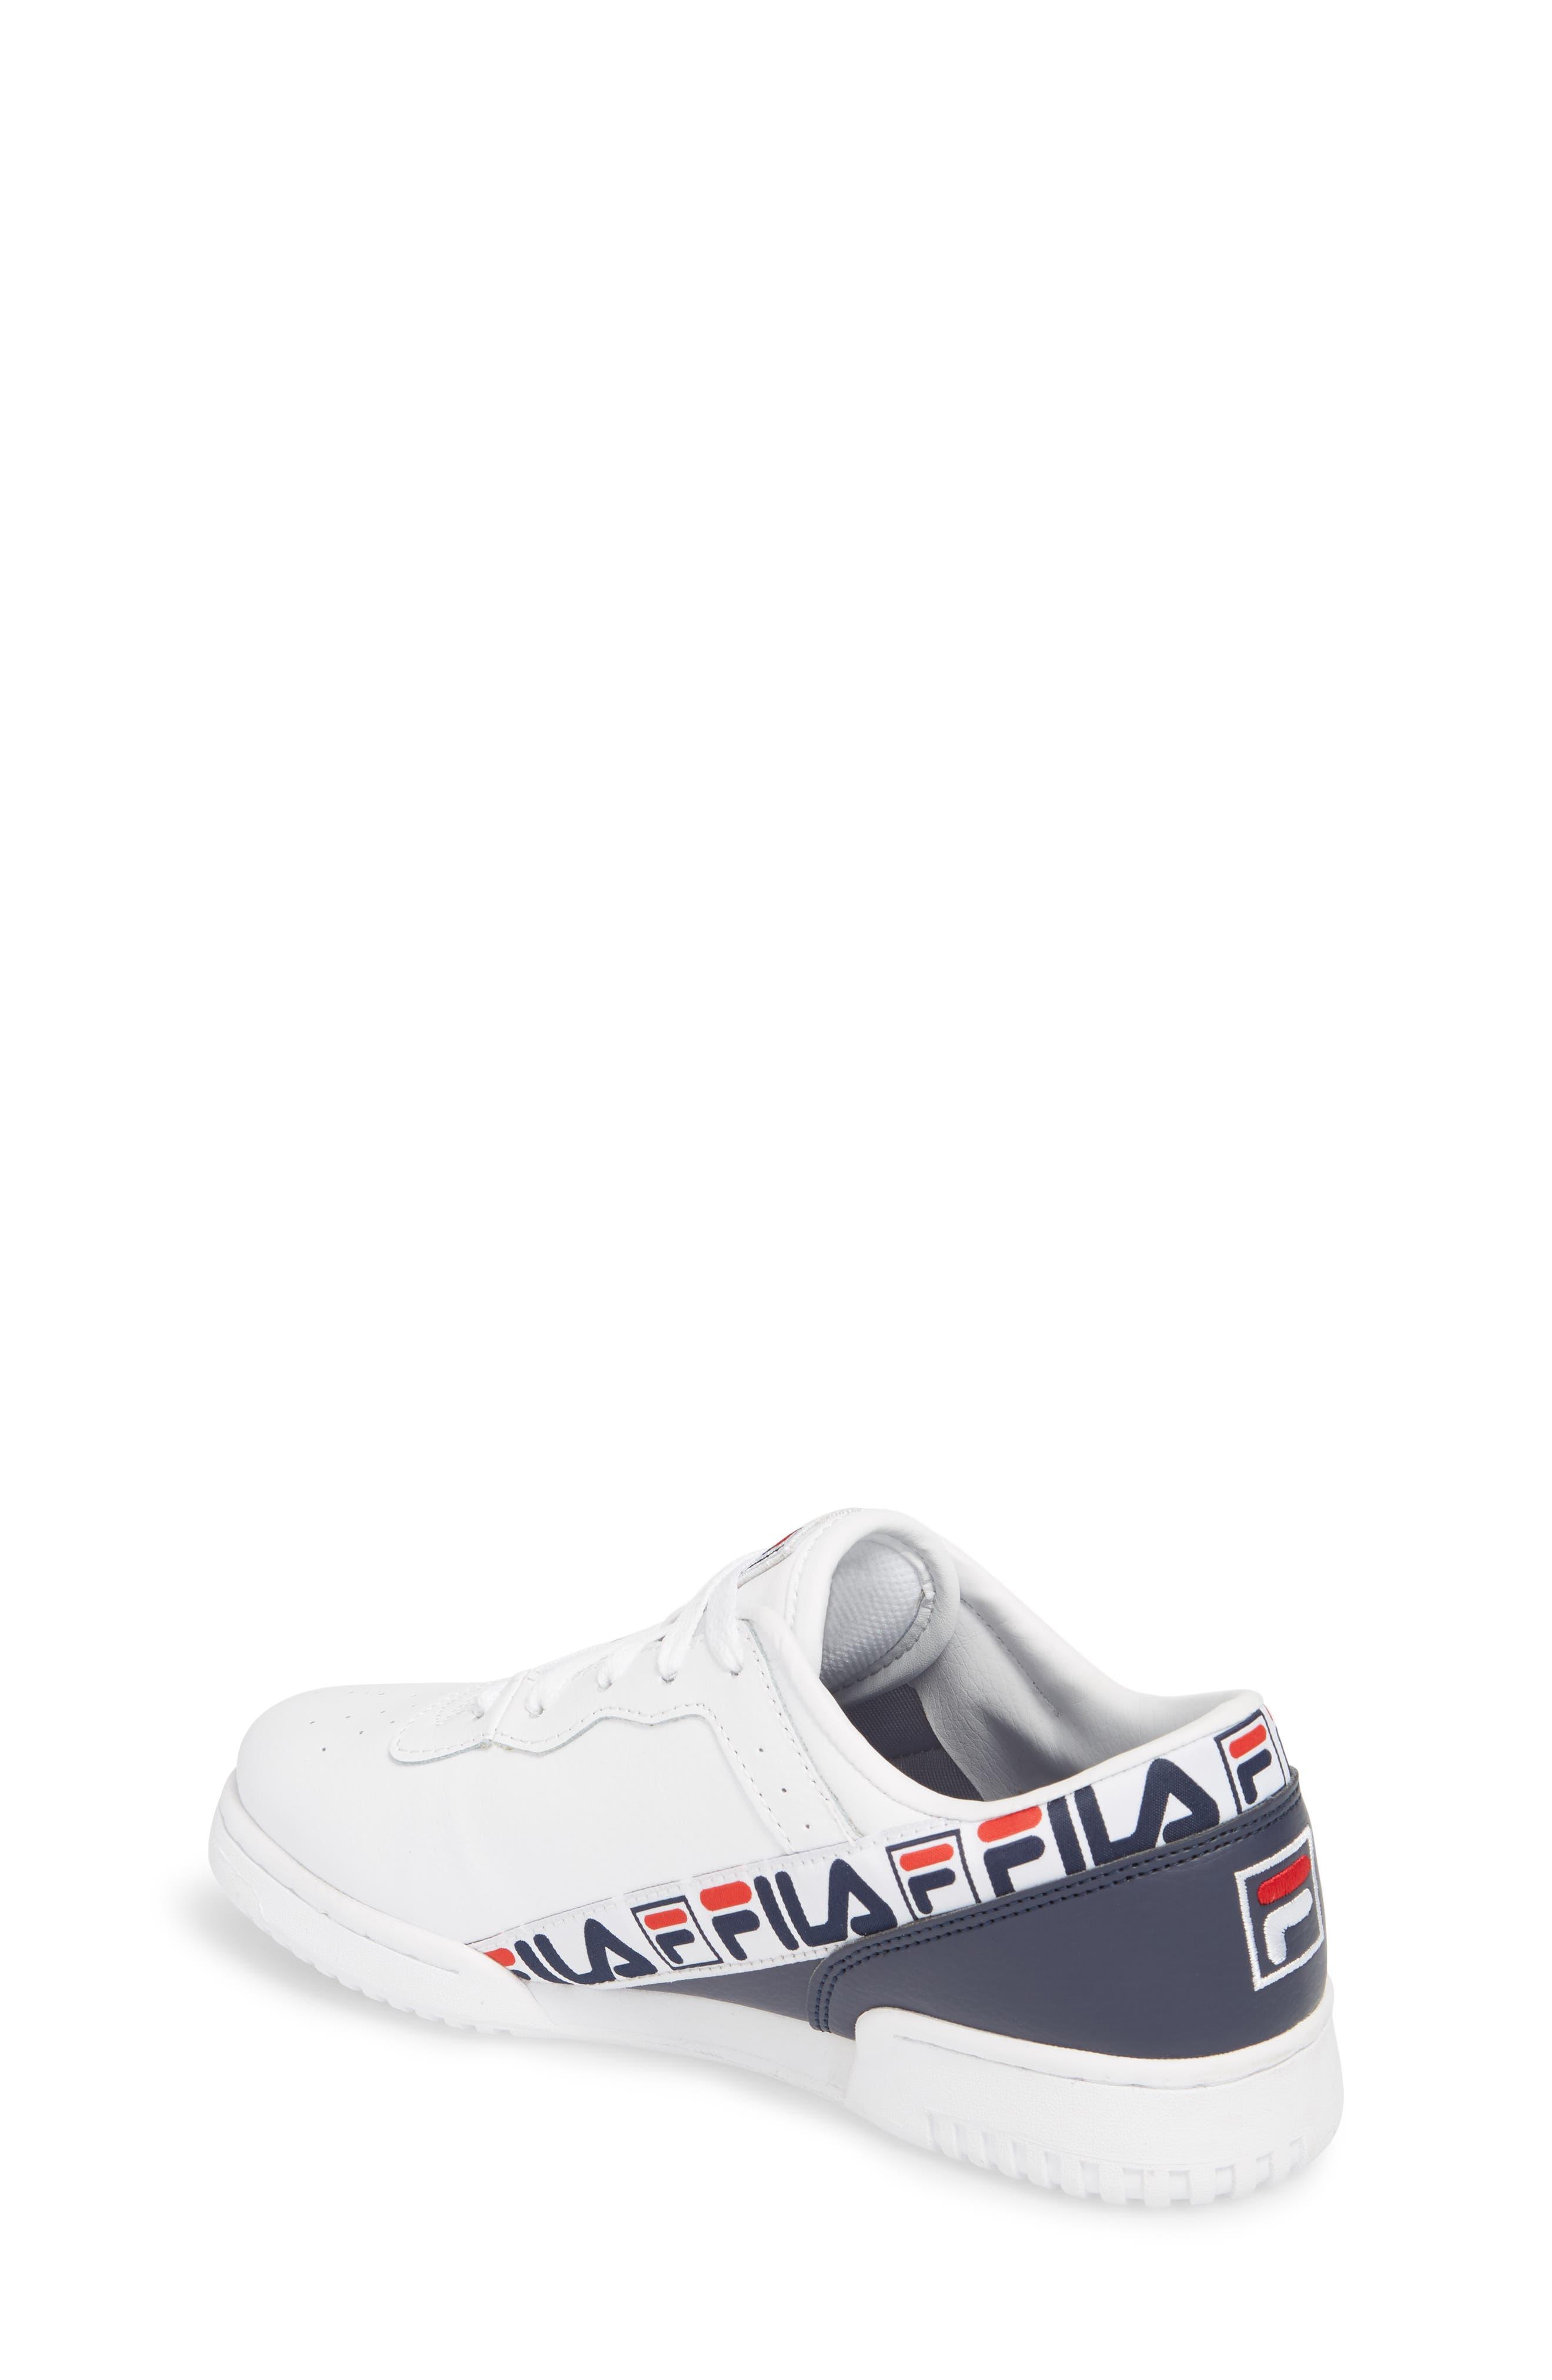 FILA, Original Fitness Logo Tape Sneaker, Alternate thumbnail 2, color, WHITE/ FILA NAVY